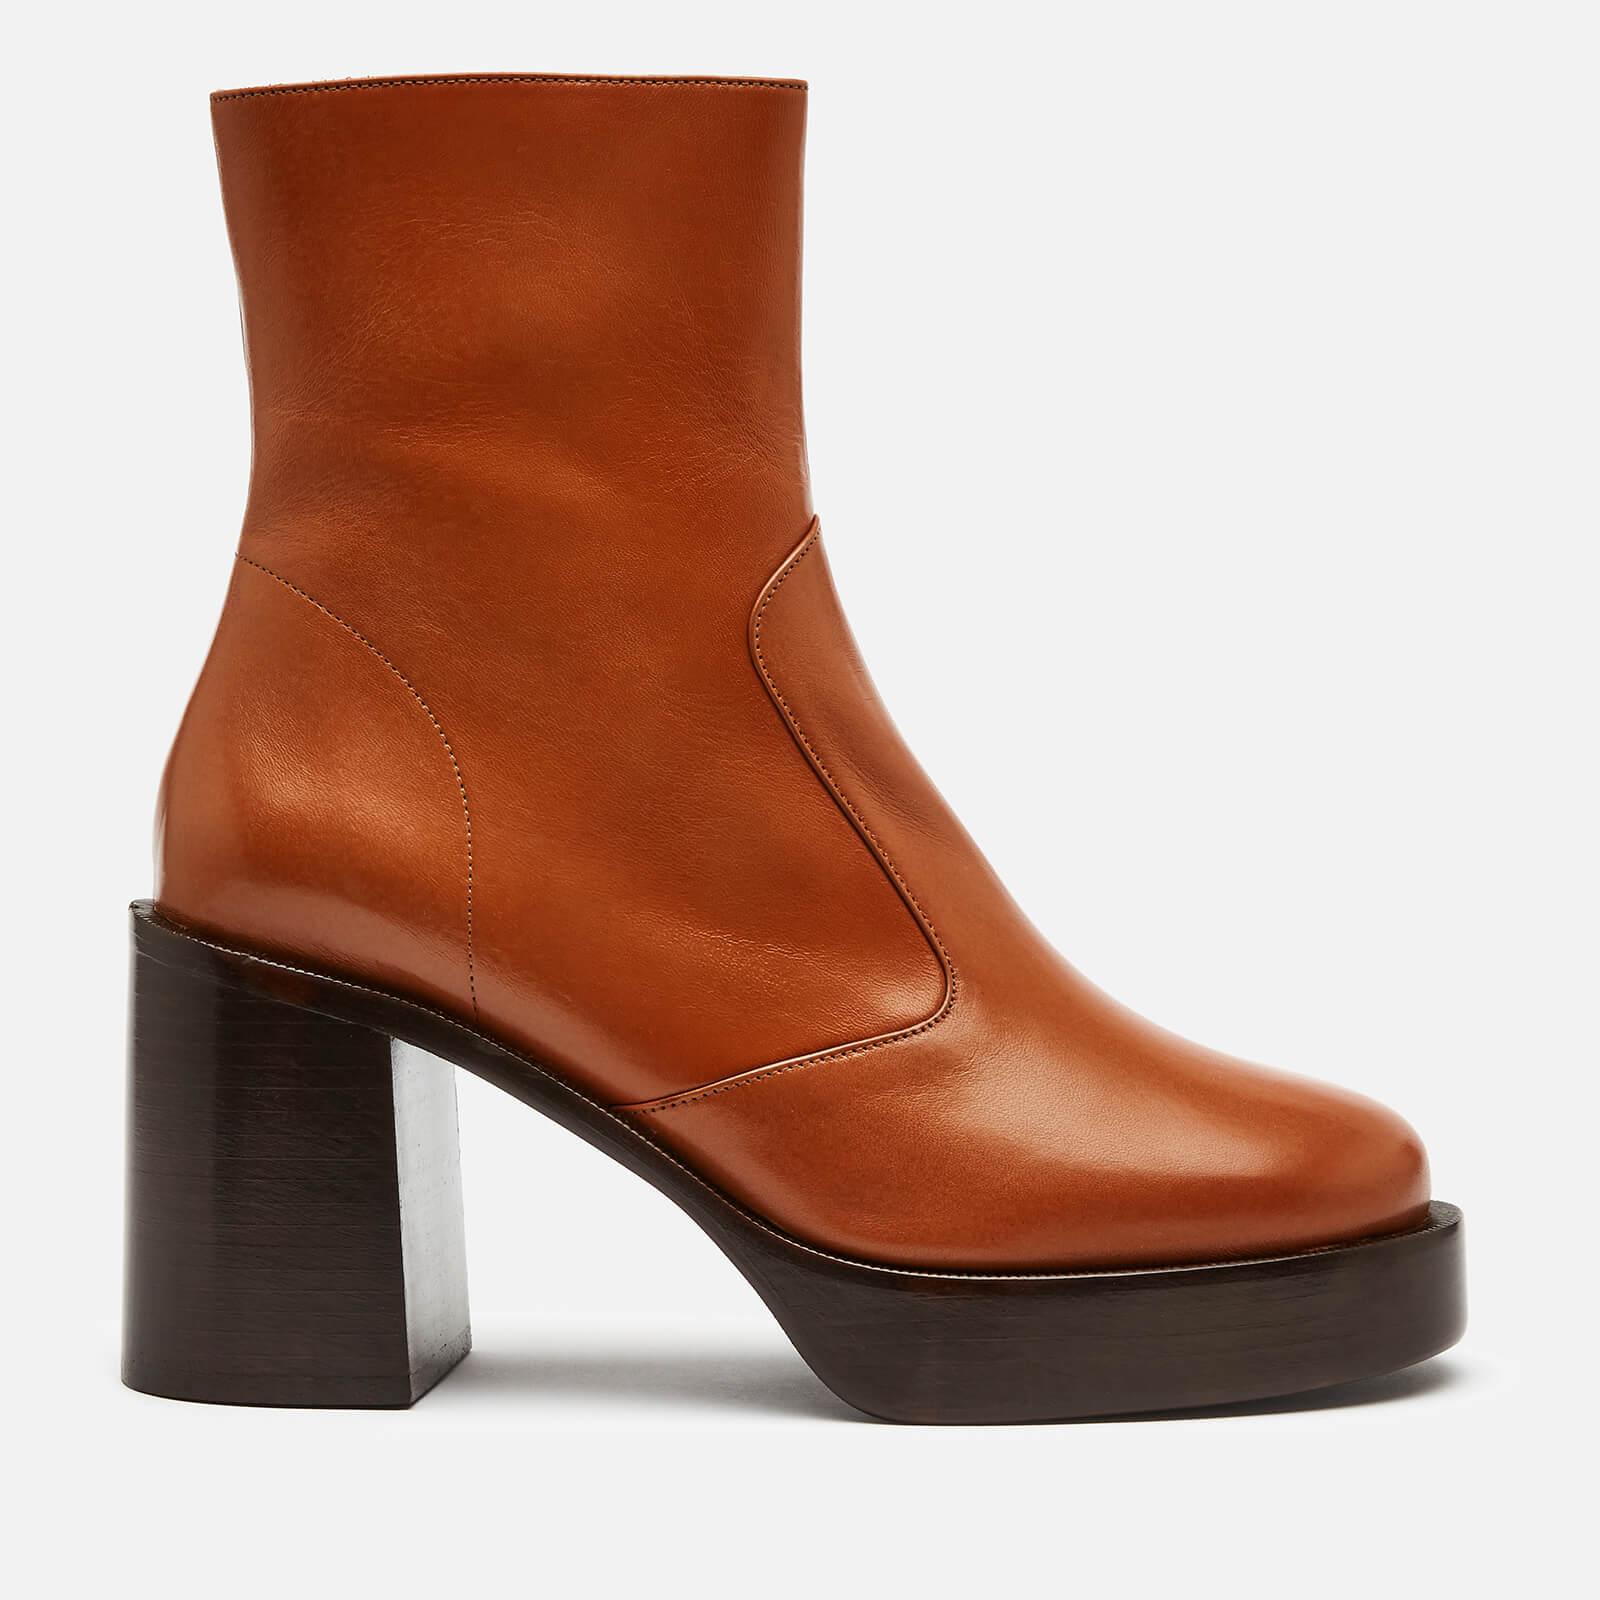 Simon Miller Women's Low Raid Heeled Boots - Toffee - Uk 5